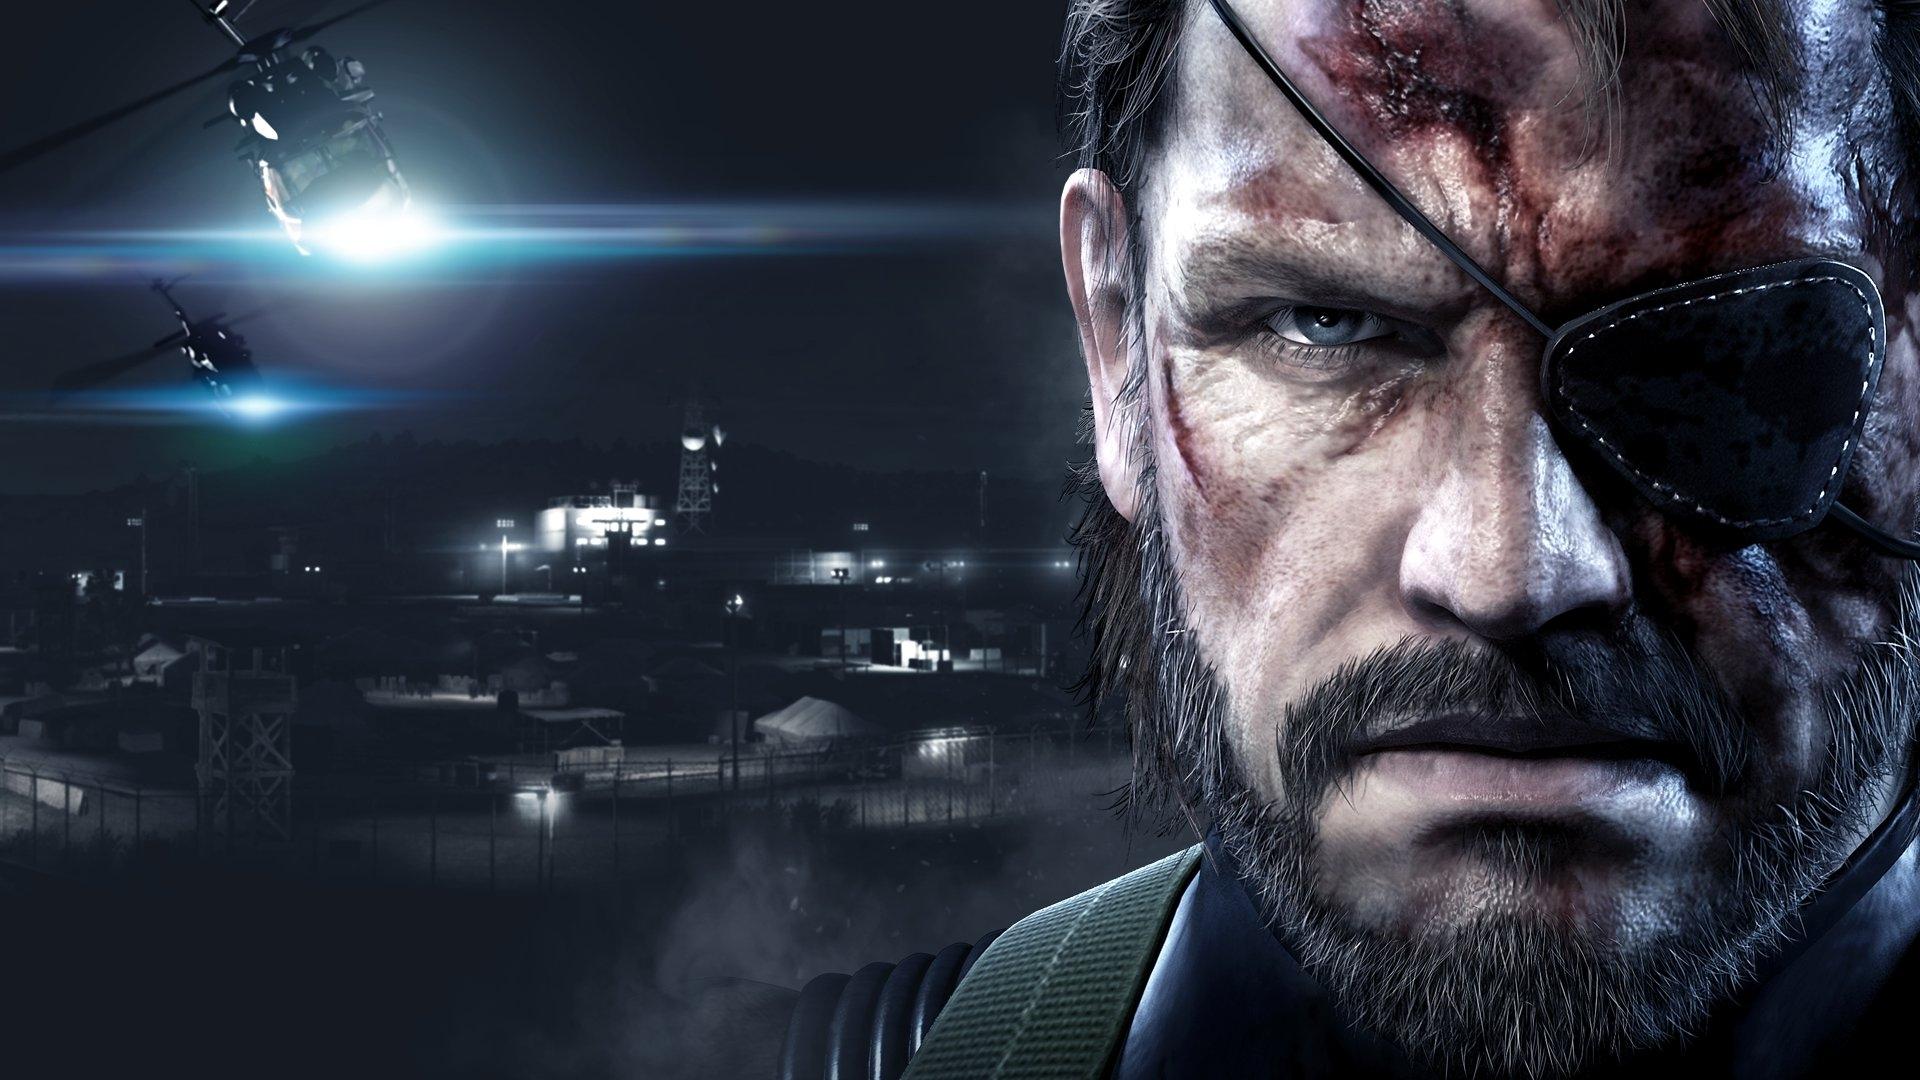 Metal Gear Solid 5 Art Wallpaper Hd Games 4k Wallpapers Images